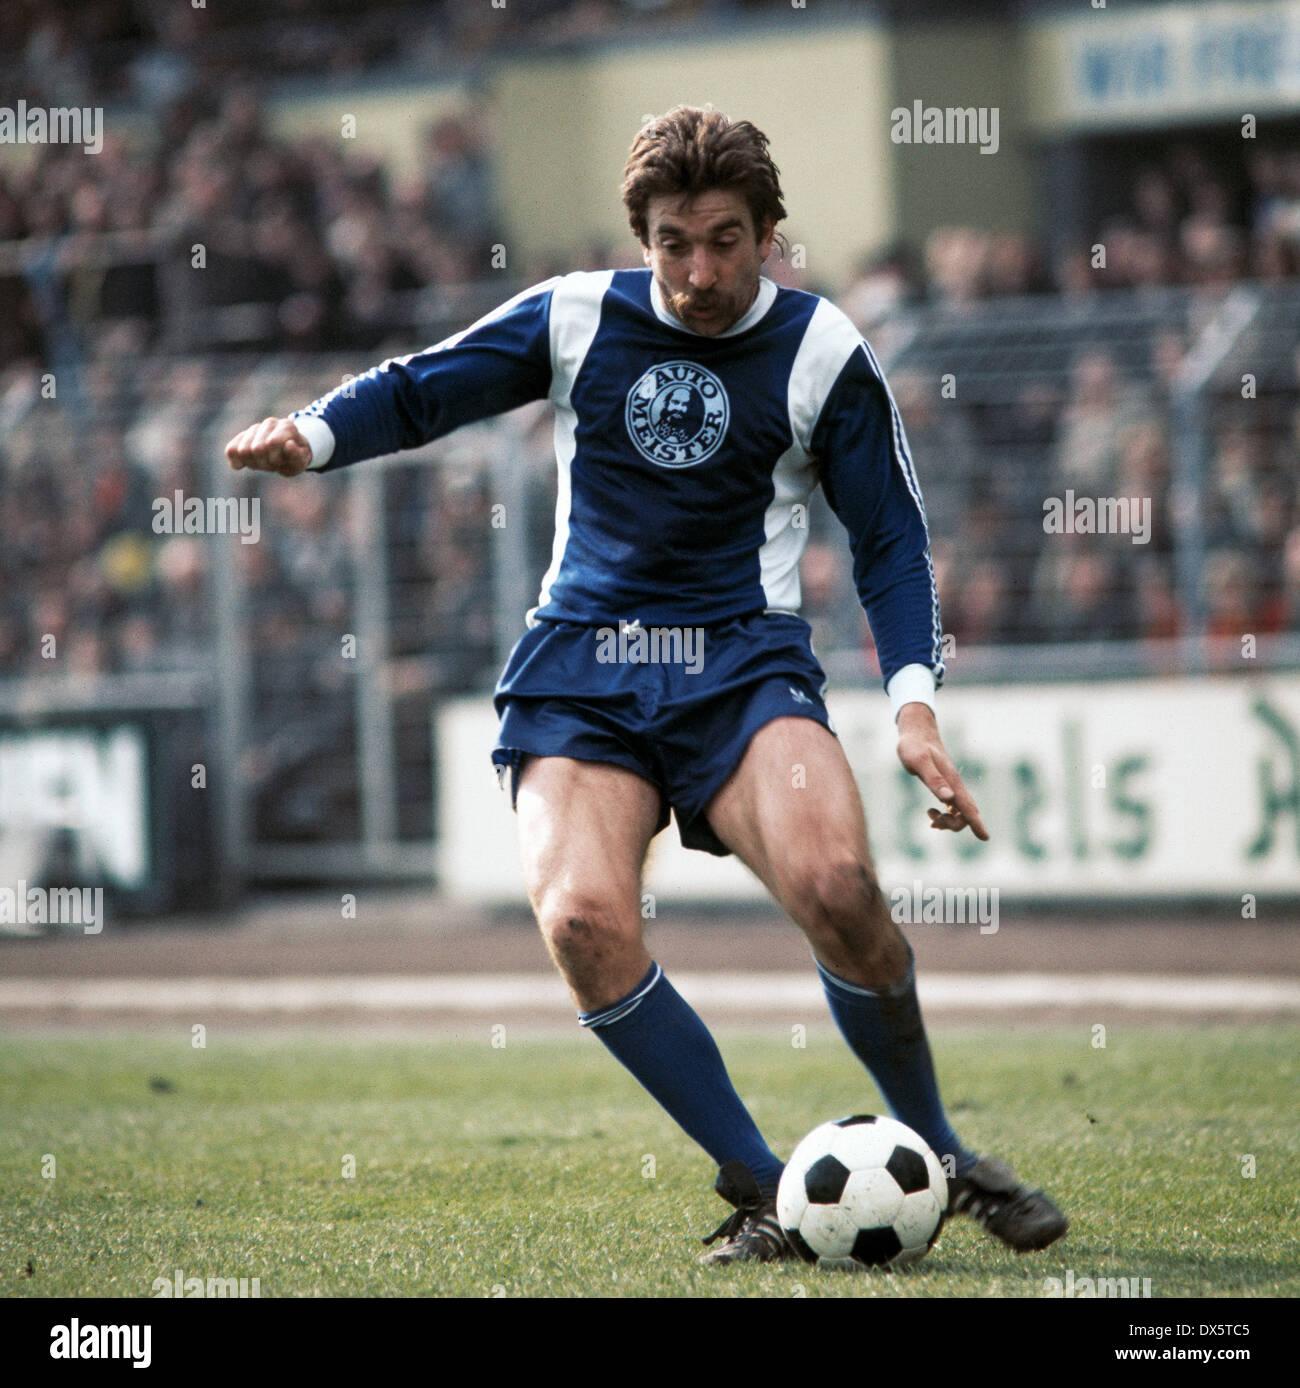 football, DFB Cup, 1976/1977, semifinal, Grotenburg Stadium, FC Bayer 05 Uerdingen versus Hertha BSC Berlin 0:1, scene of the match, Bernd Gersdorff (Hertha) in ball possession - Stock Image